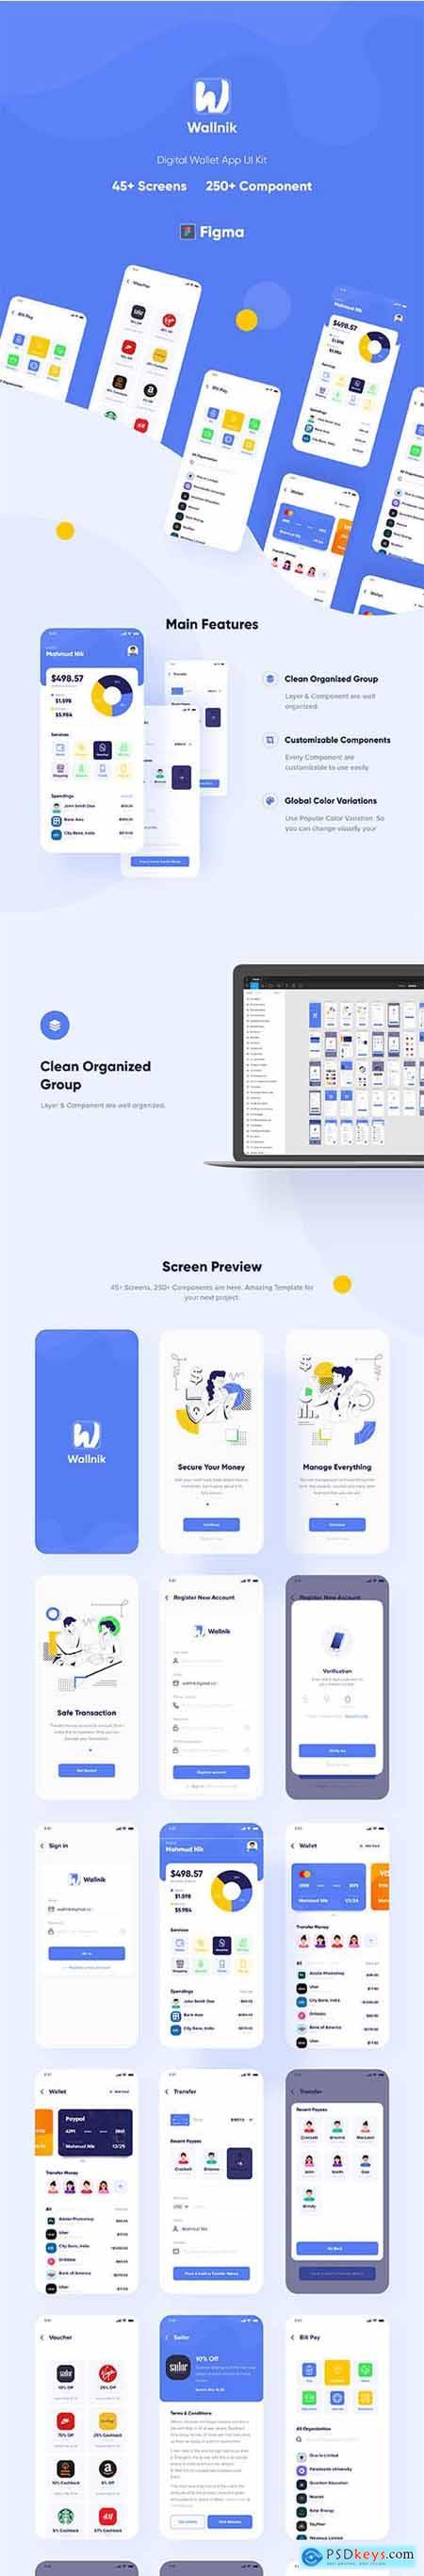 Wallnik - Digital Wallet App